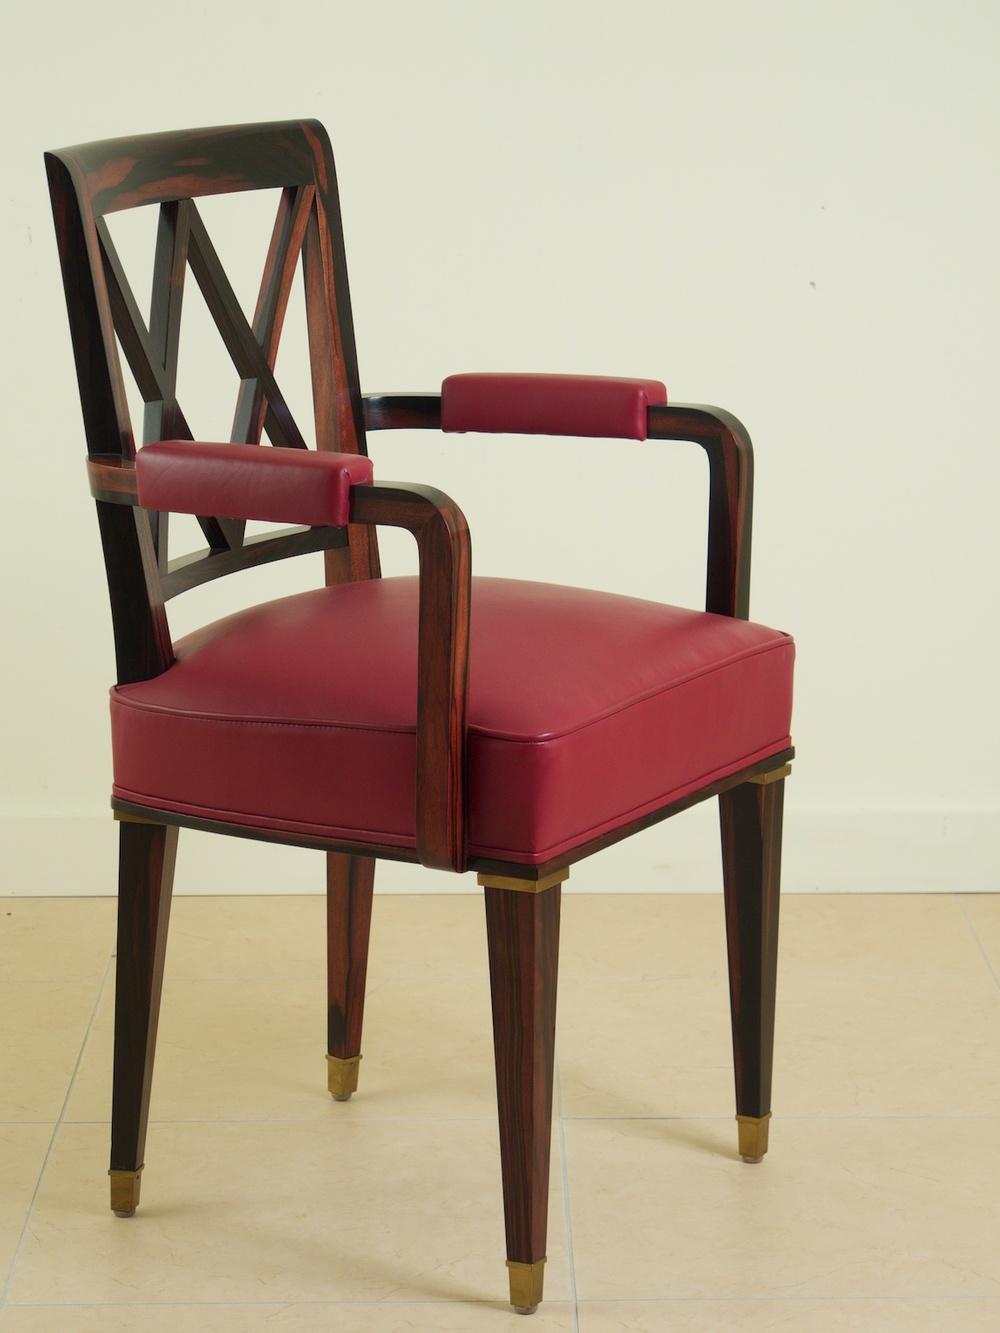 Adnet+macassar+ebony+armchairs+3.jpg